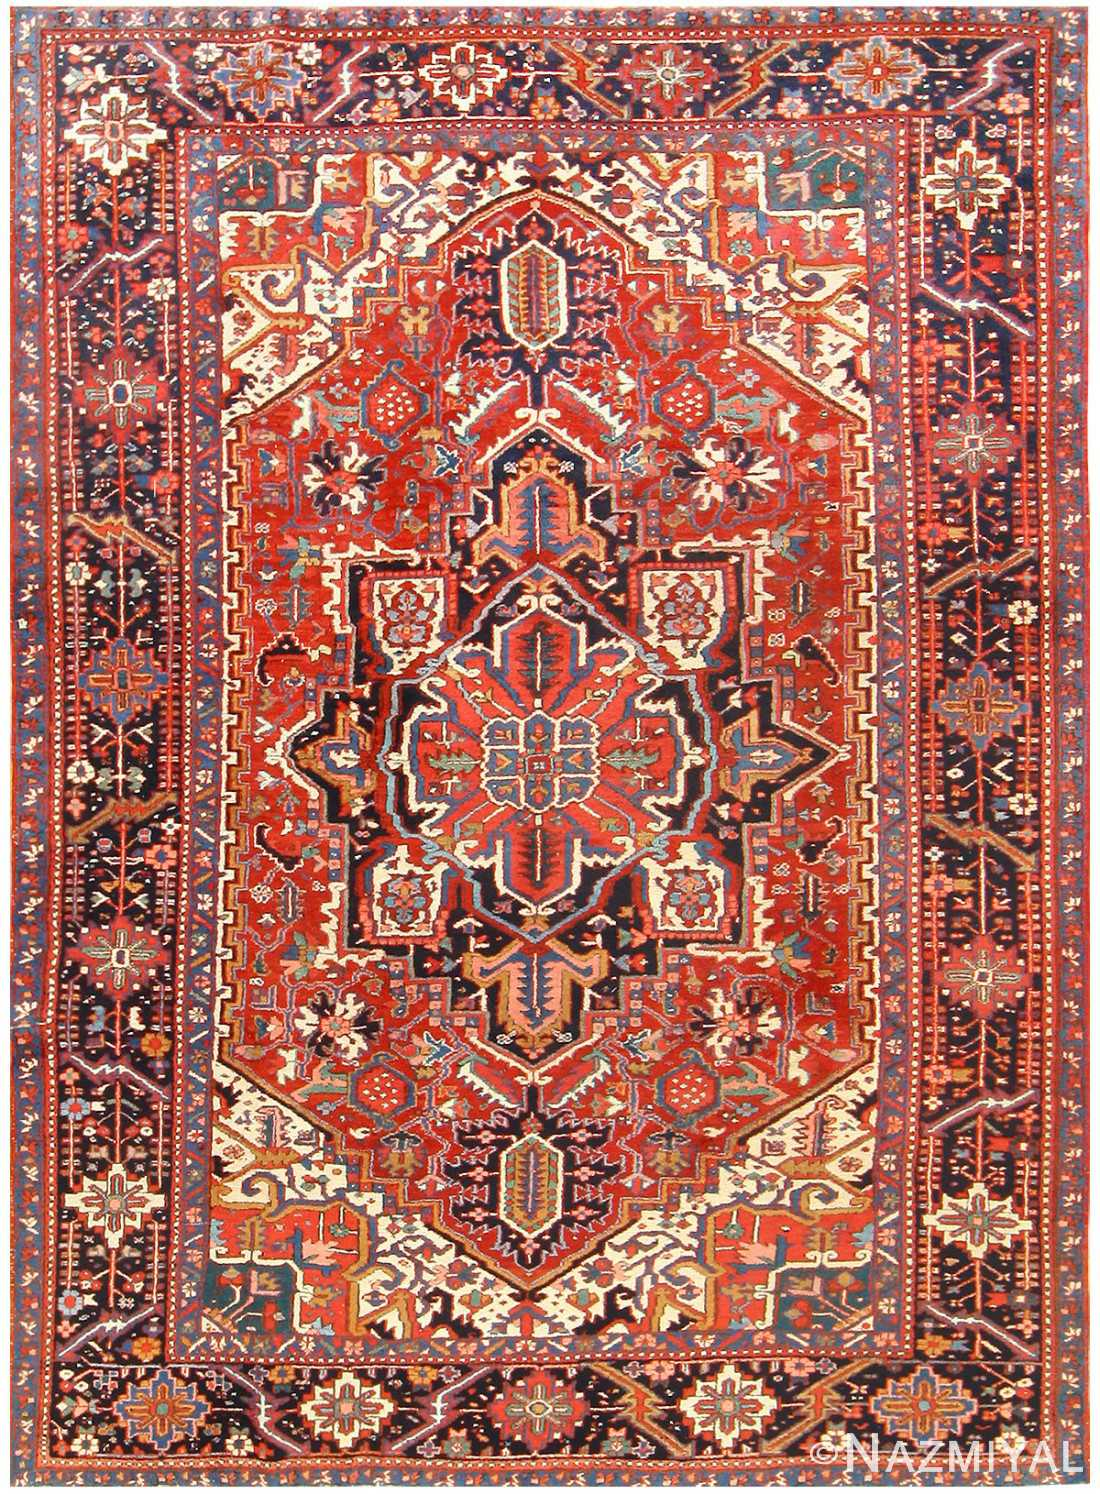 Antique Persian Heriz Rug 48316 by Nazmiyal